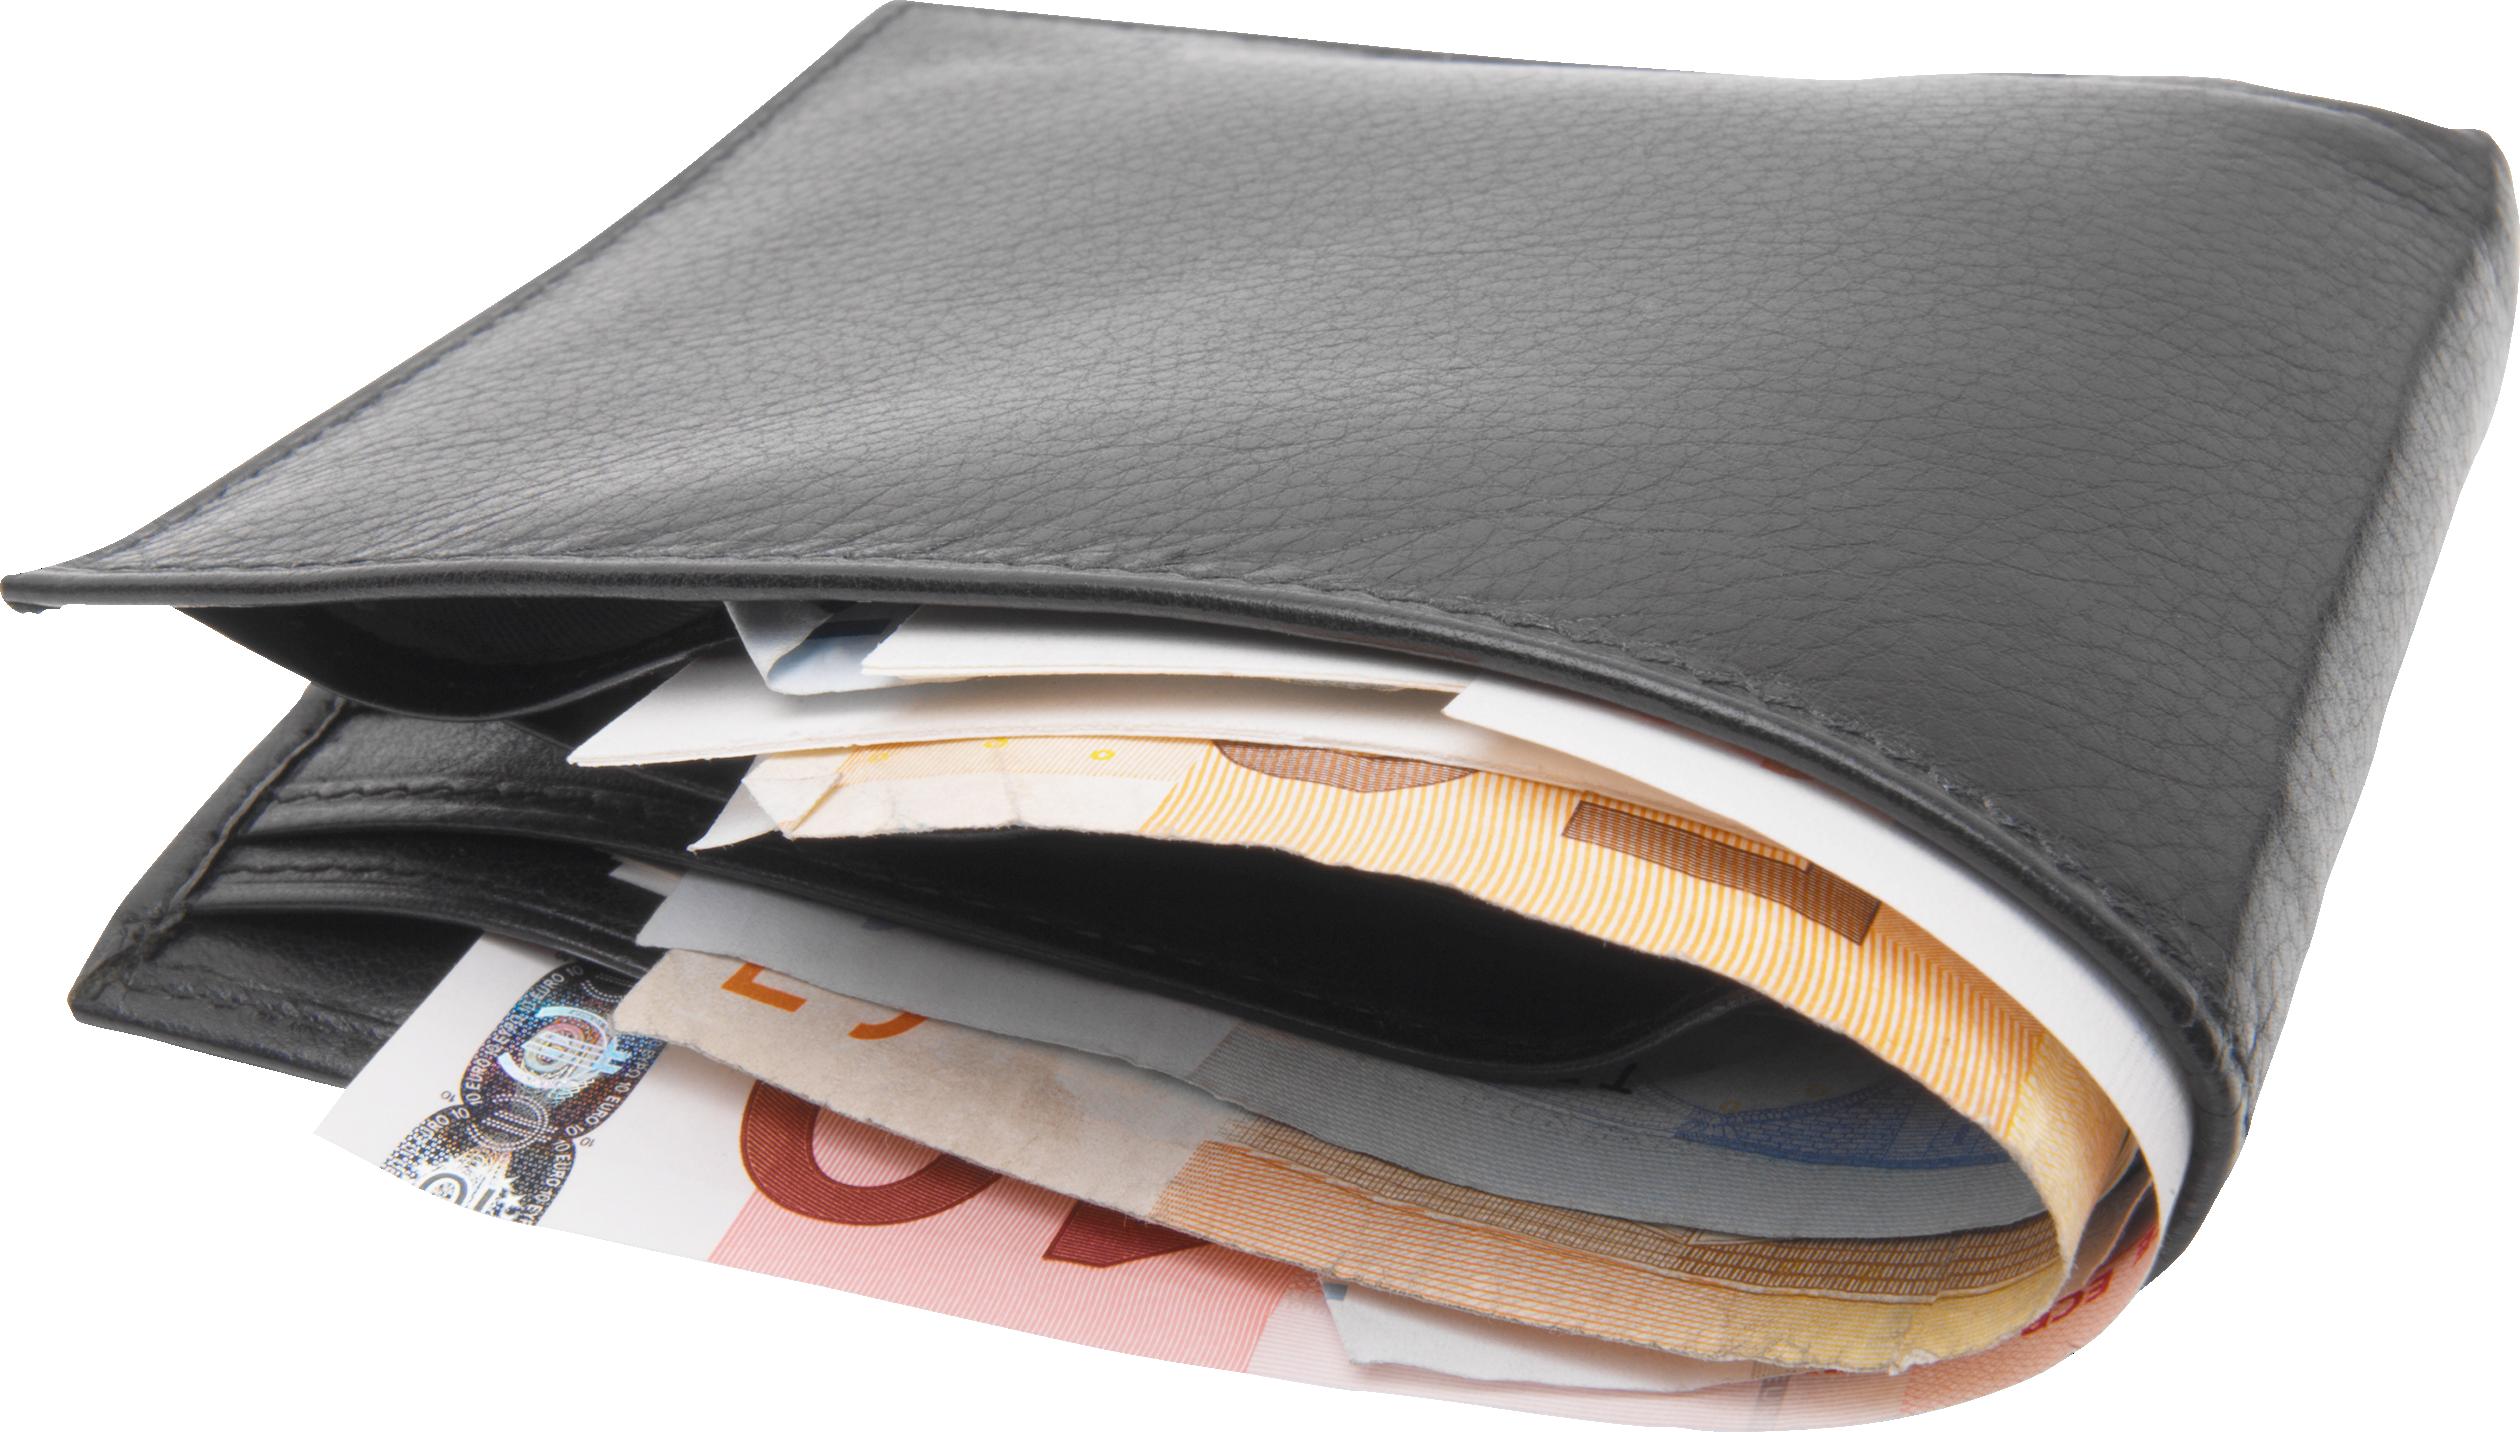 Wallet - Wallet HD PNG